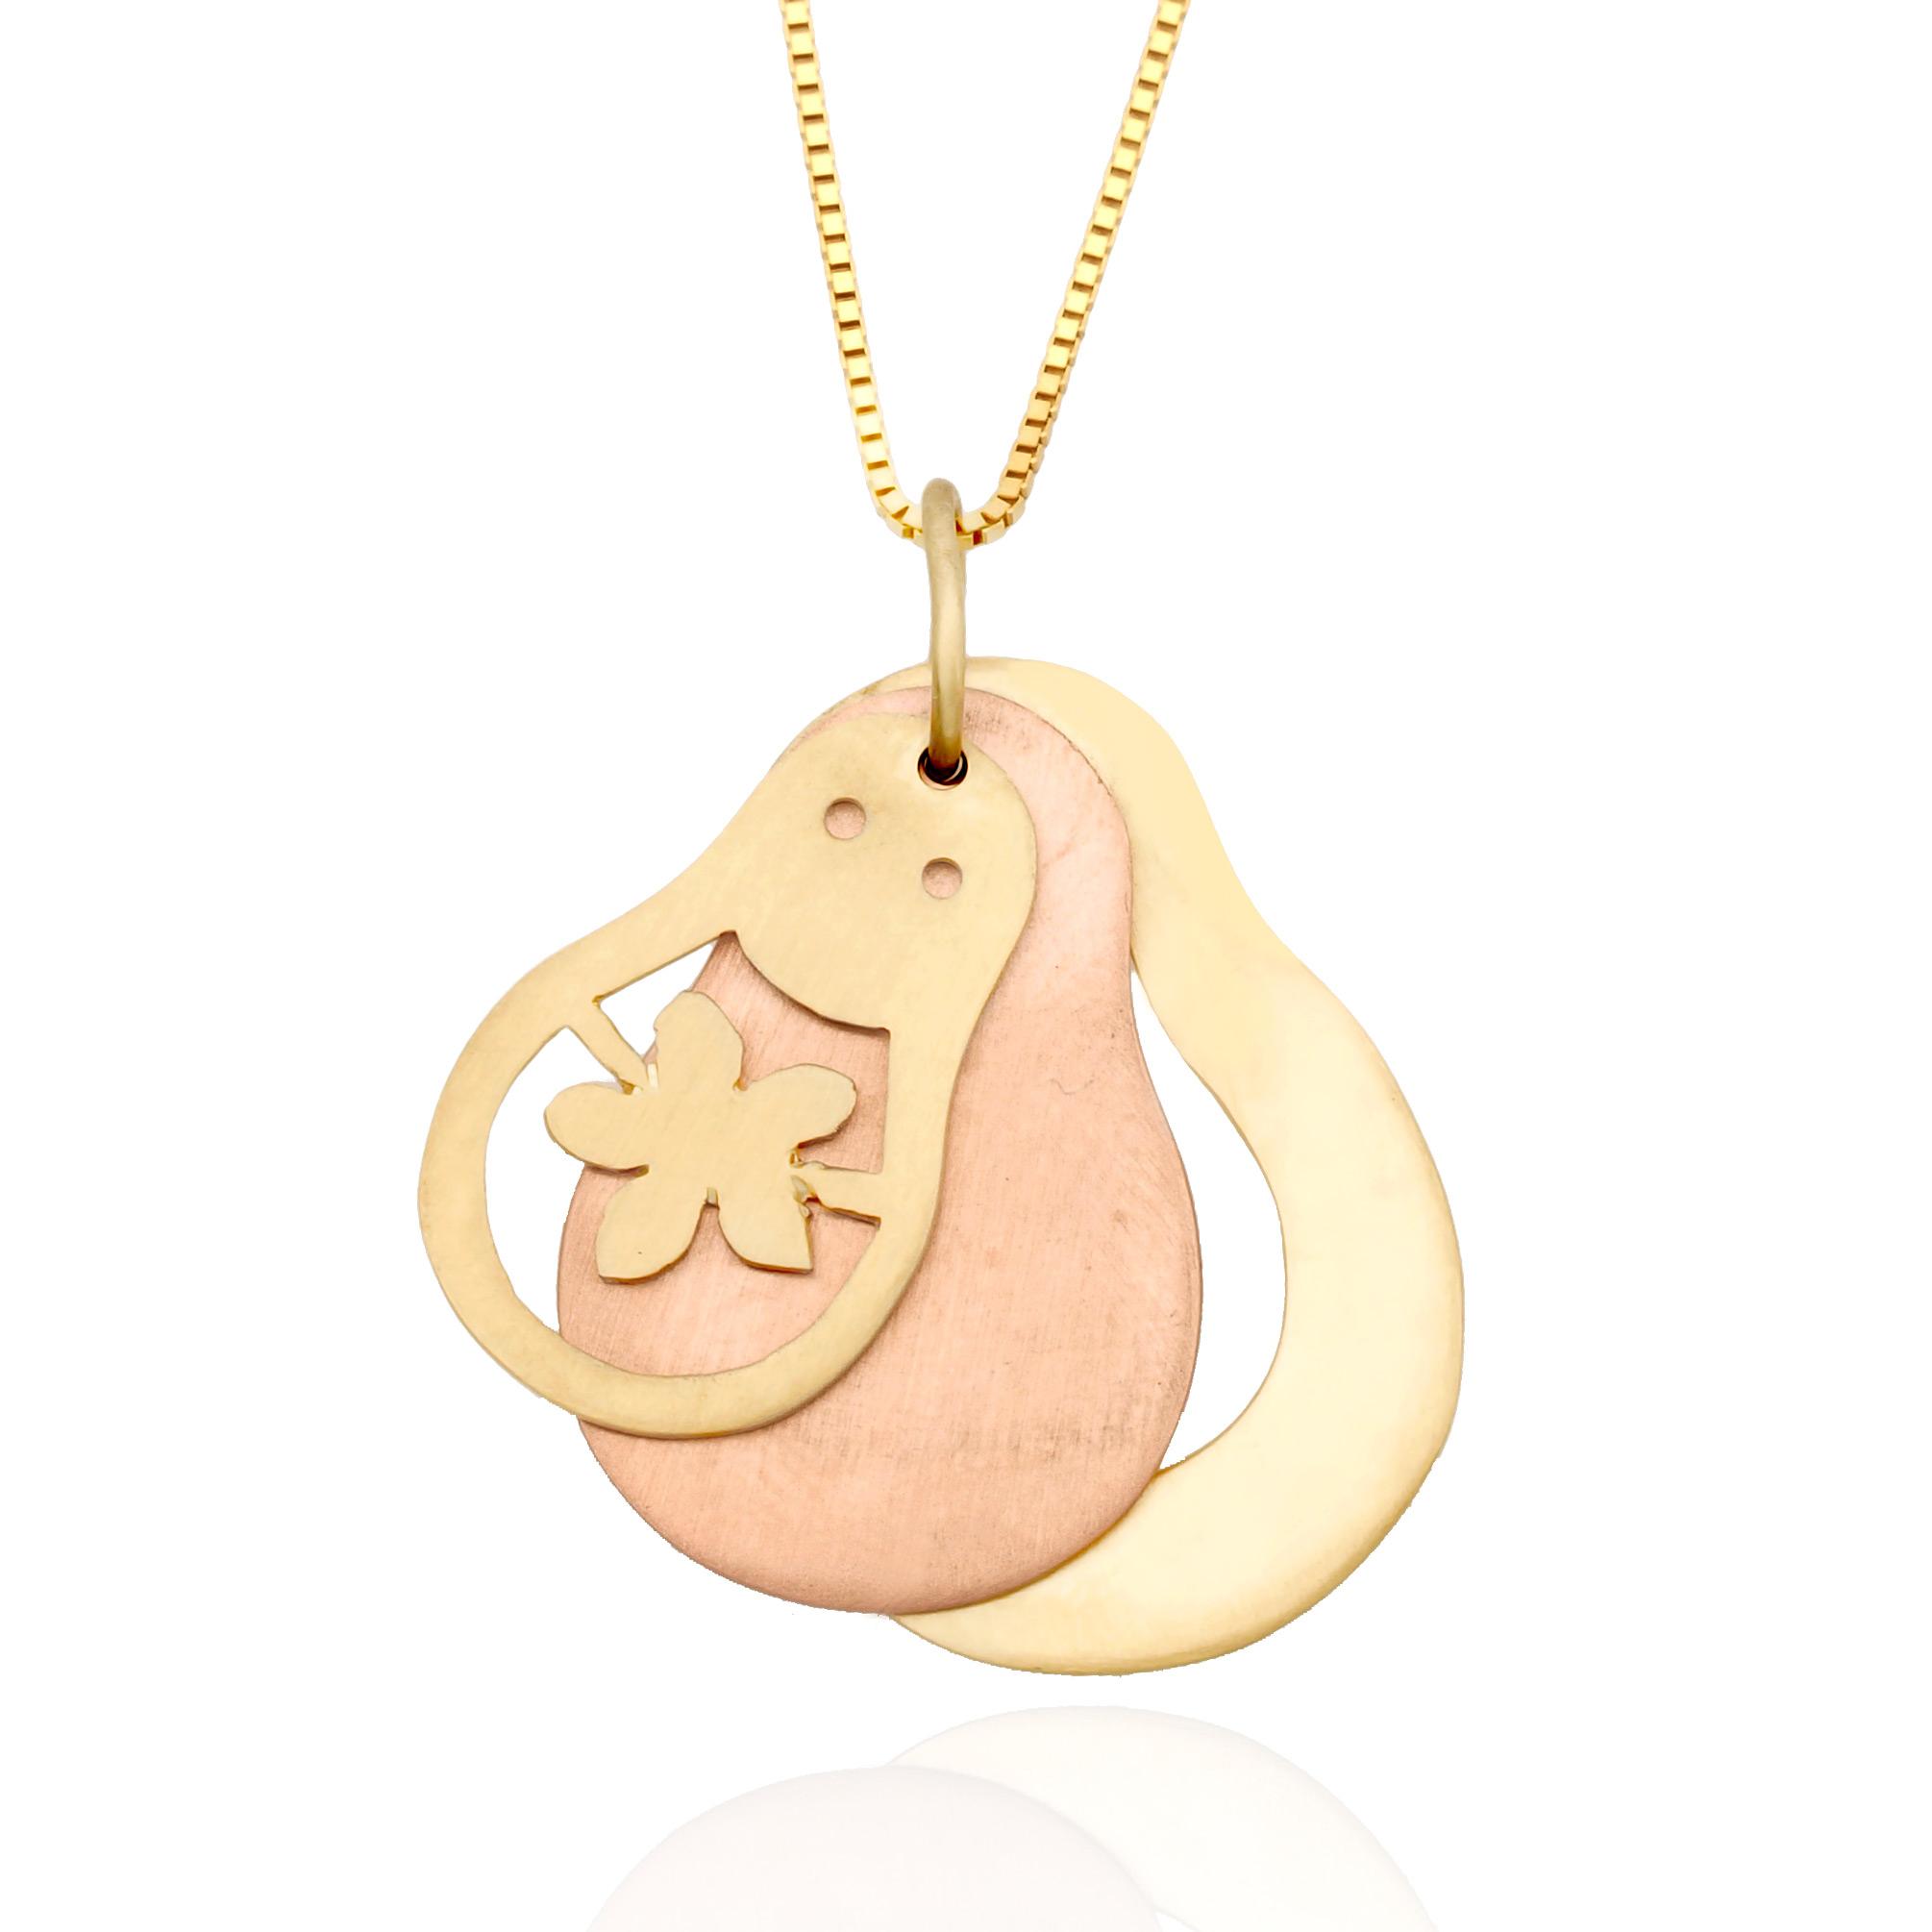 Tal's Babushka Necklace